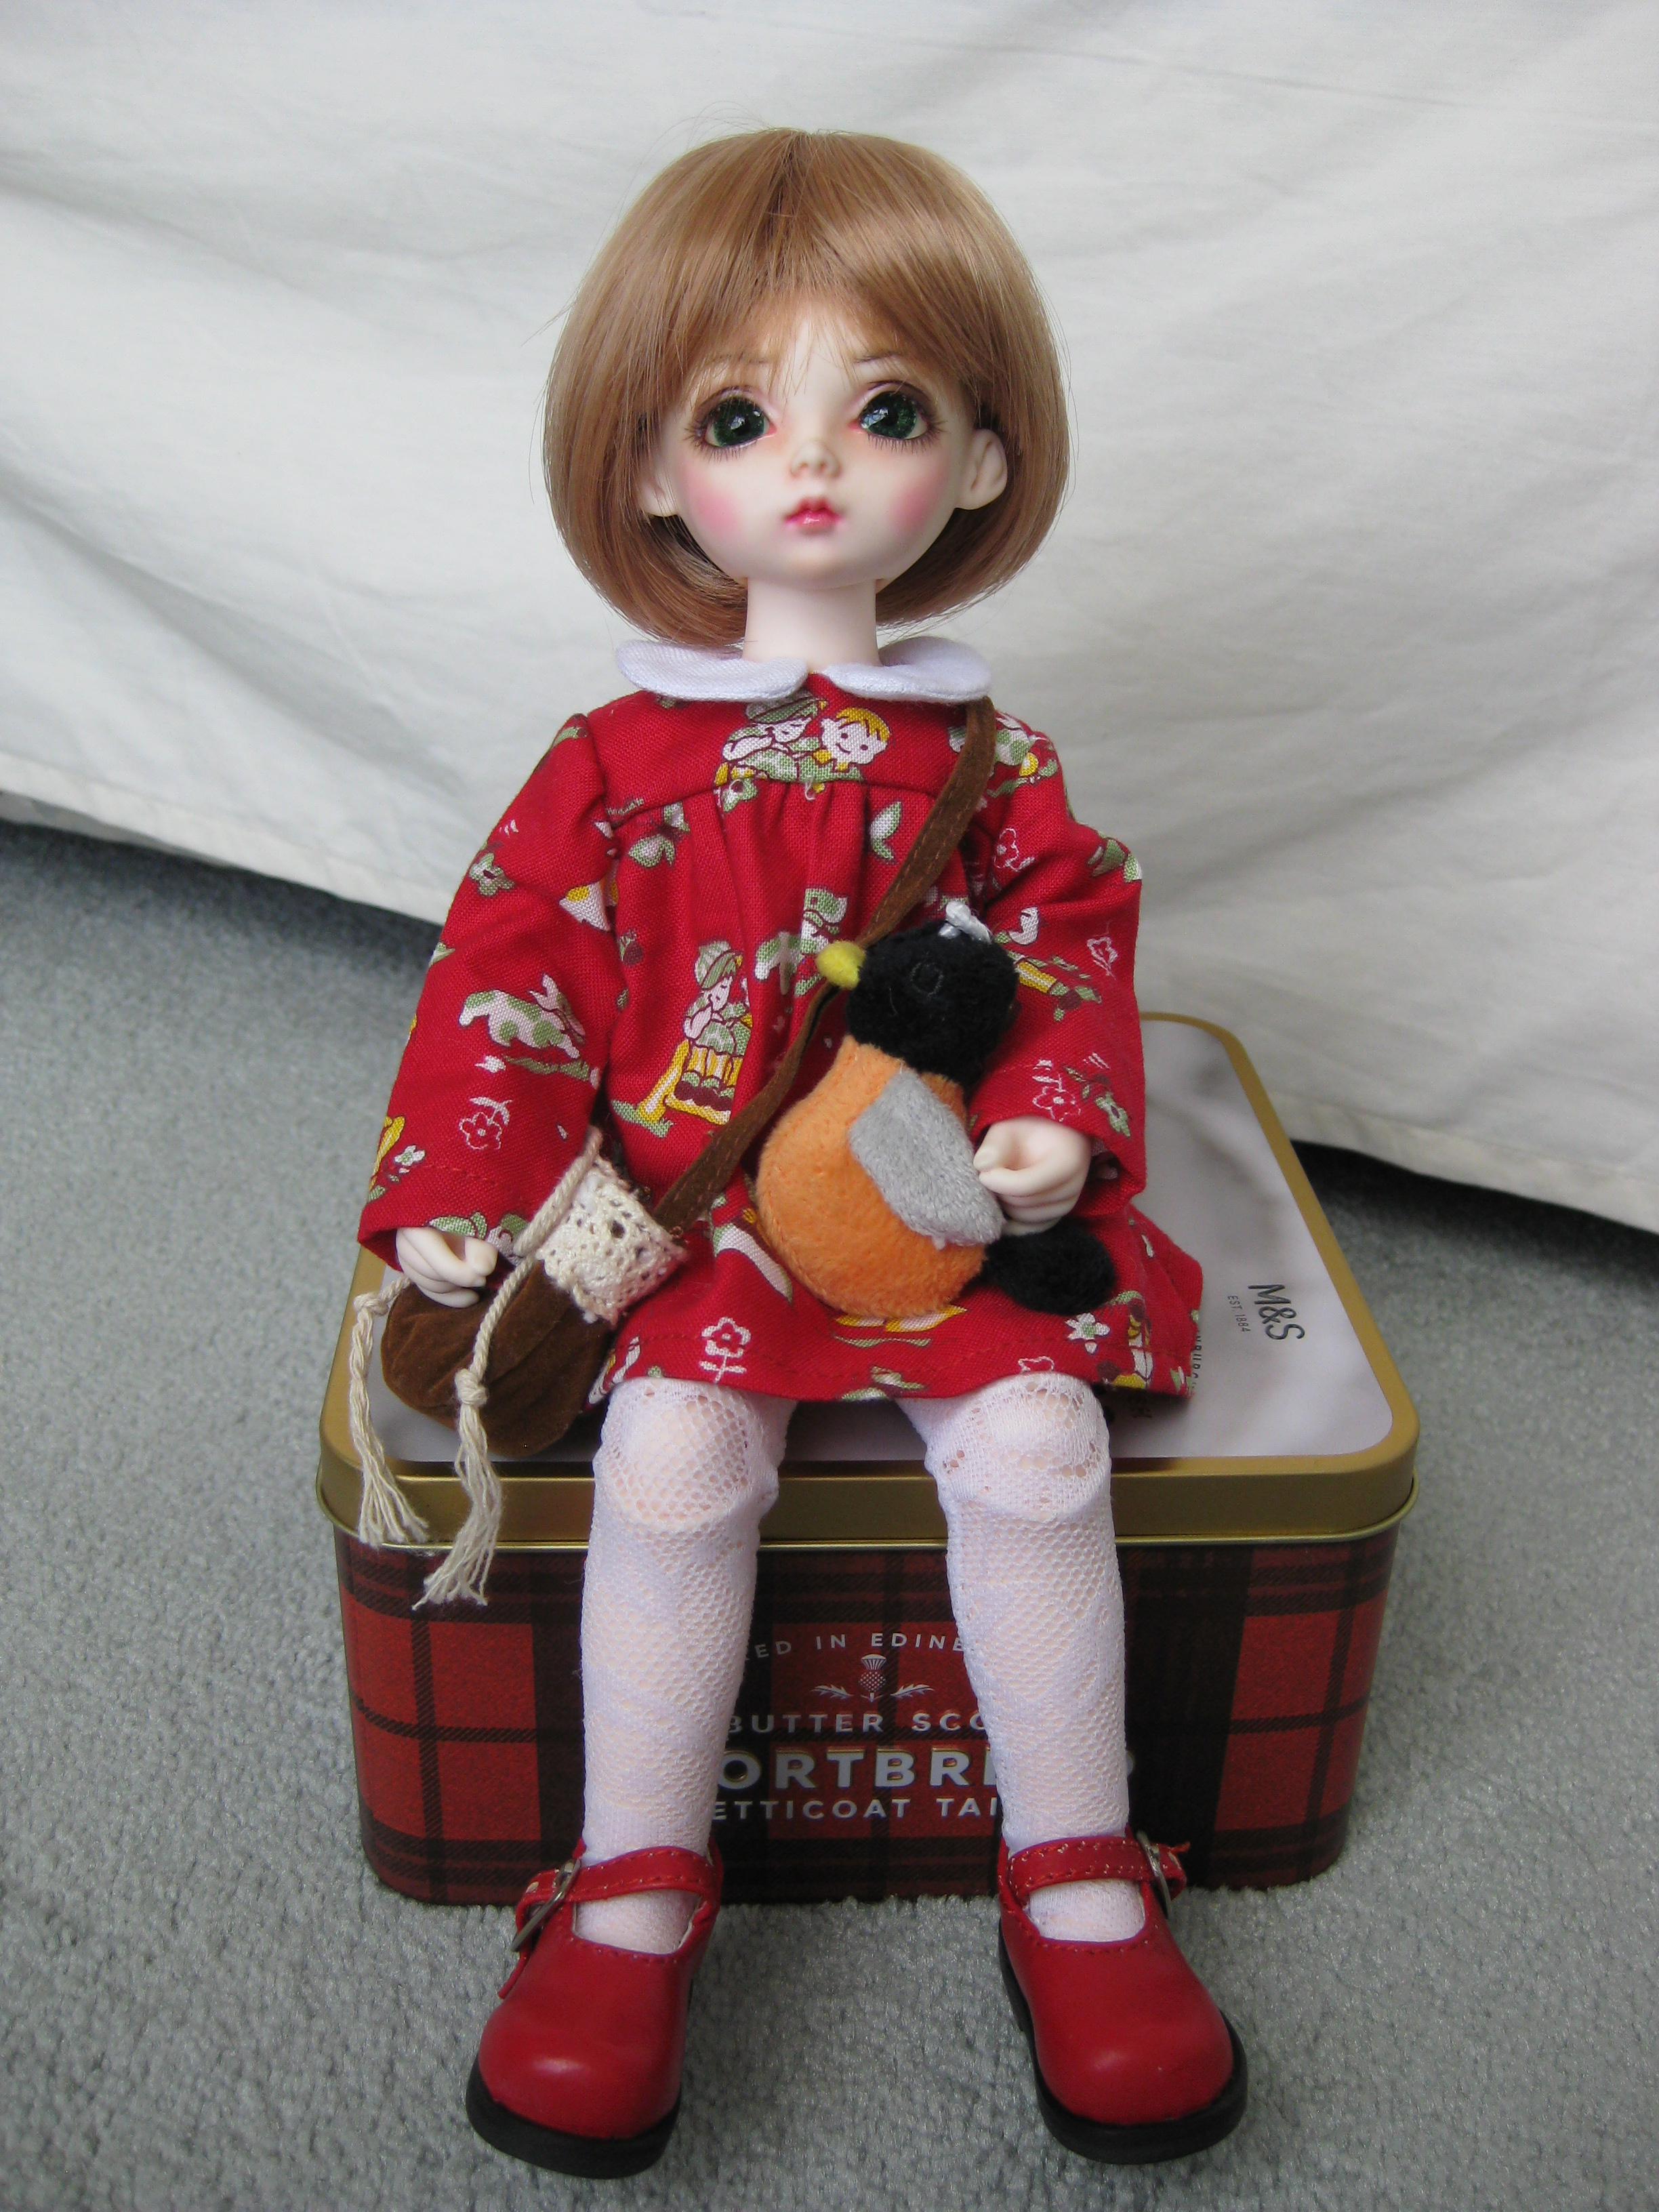 Ellie Grace, new red Dress